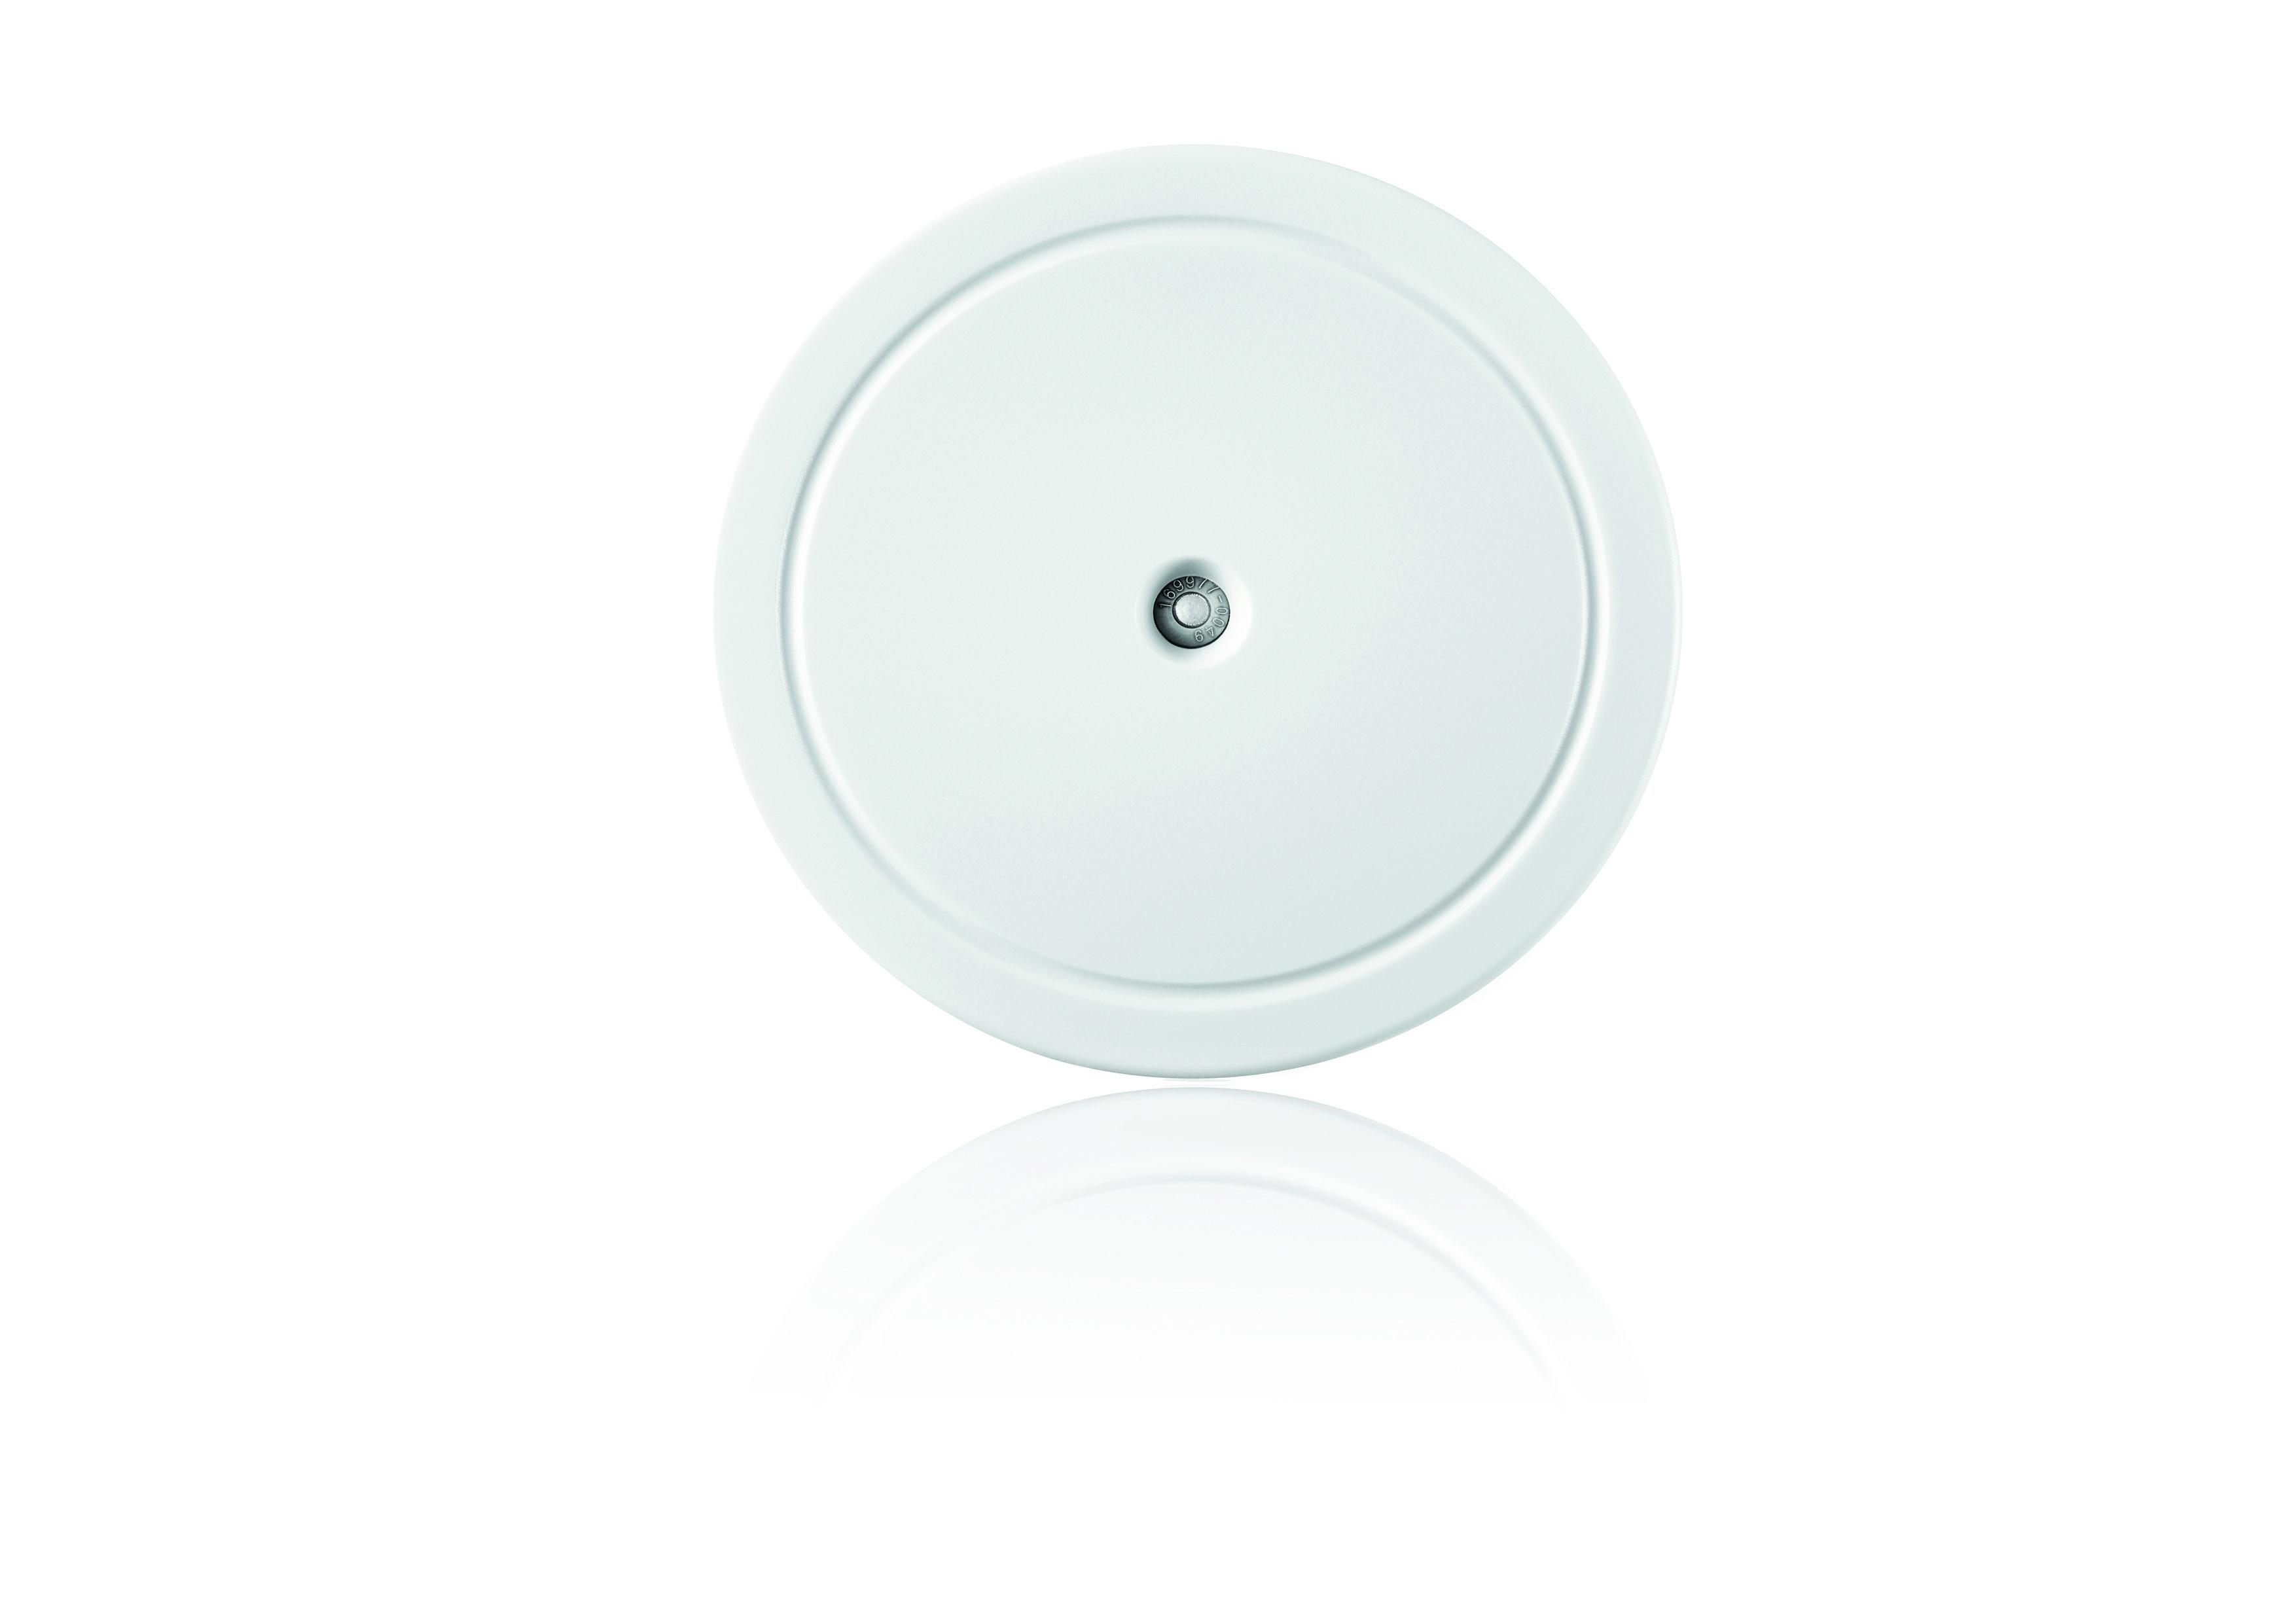 Condair Luftbefeuchtungs Modul Humilife Led Spots Led Zimmerdecken